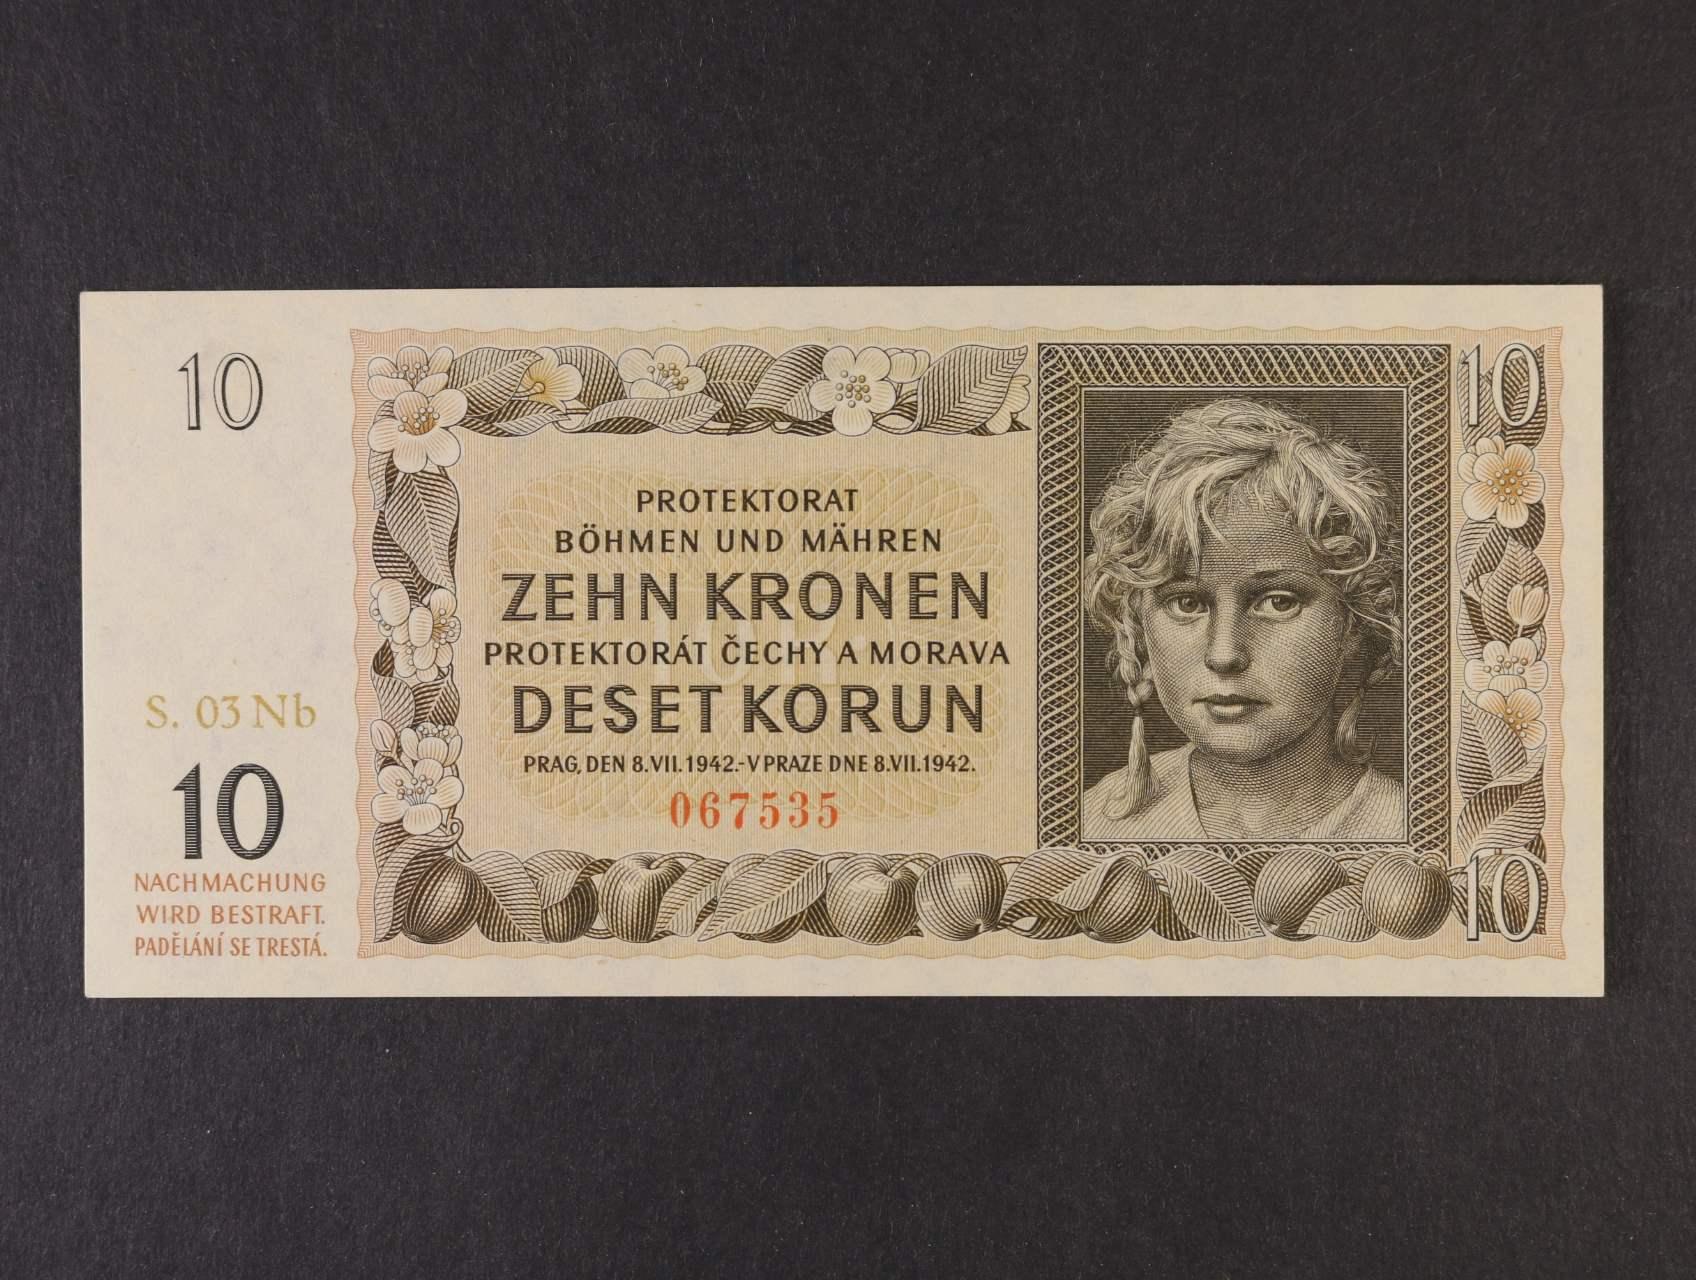 10 K 1942 série 03 Nb, Ba. 37c, Pi. 8